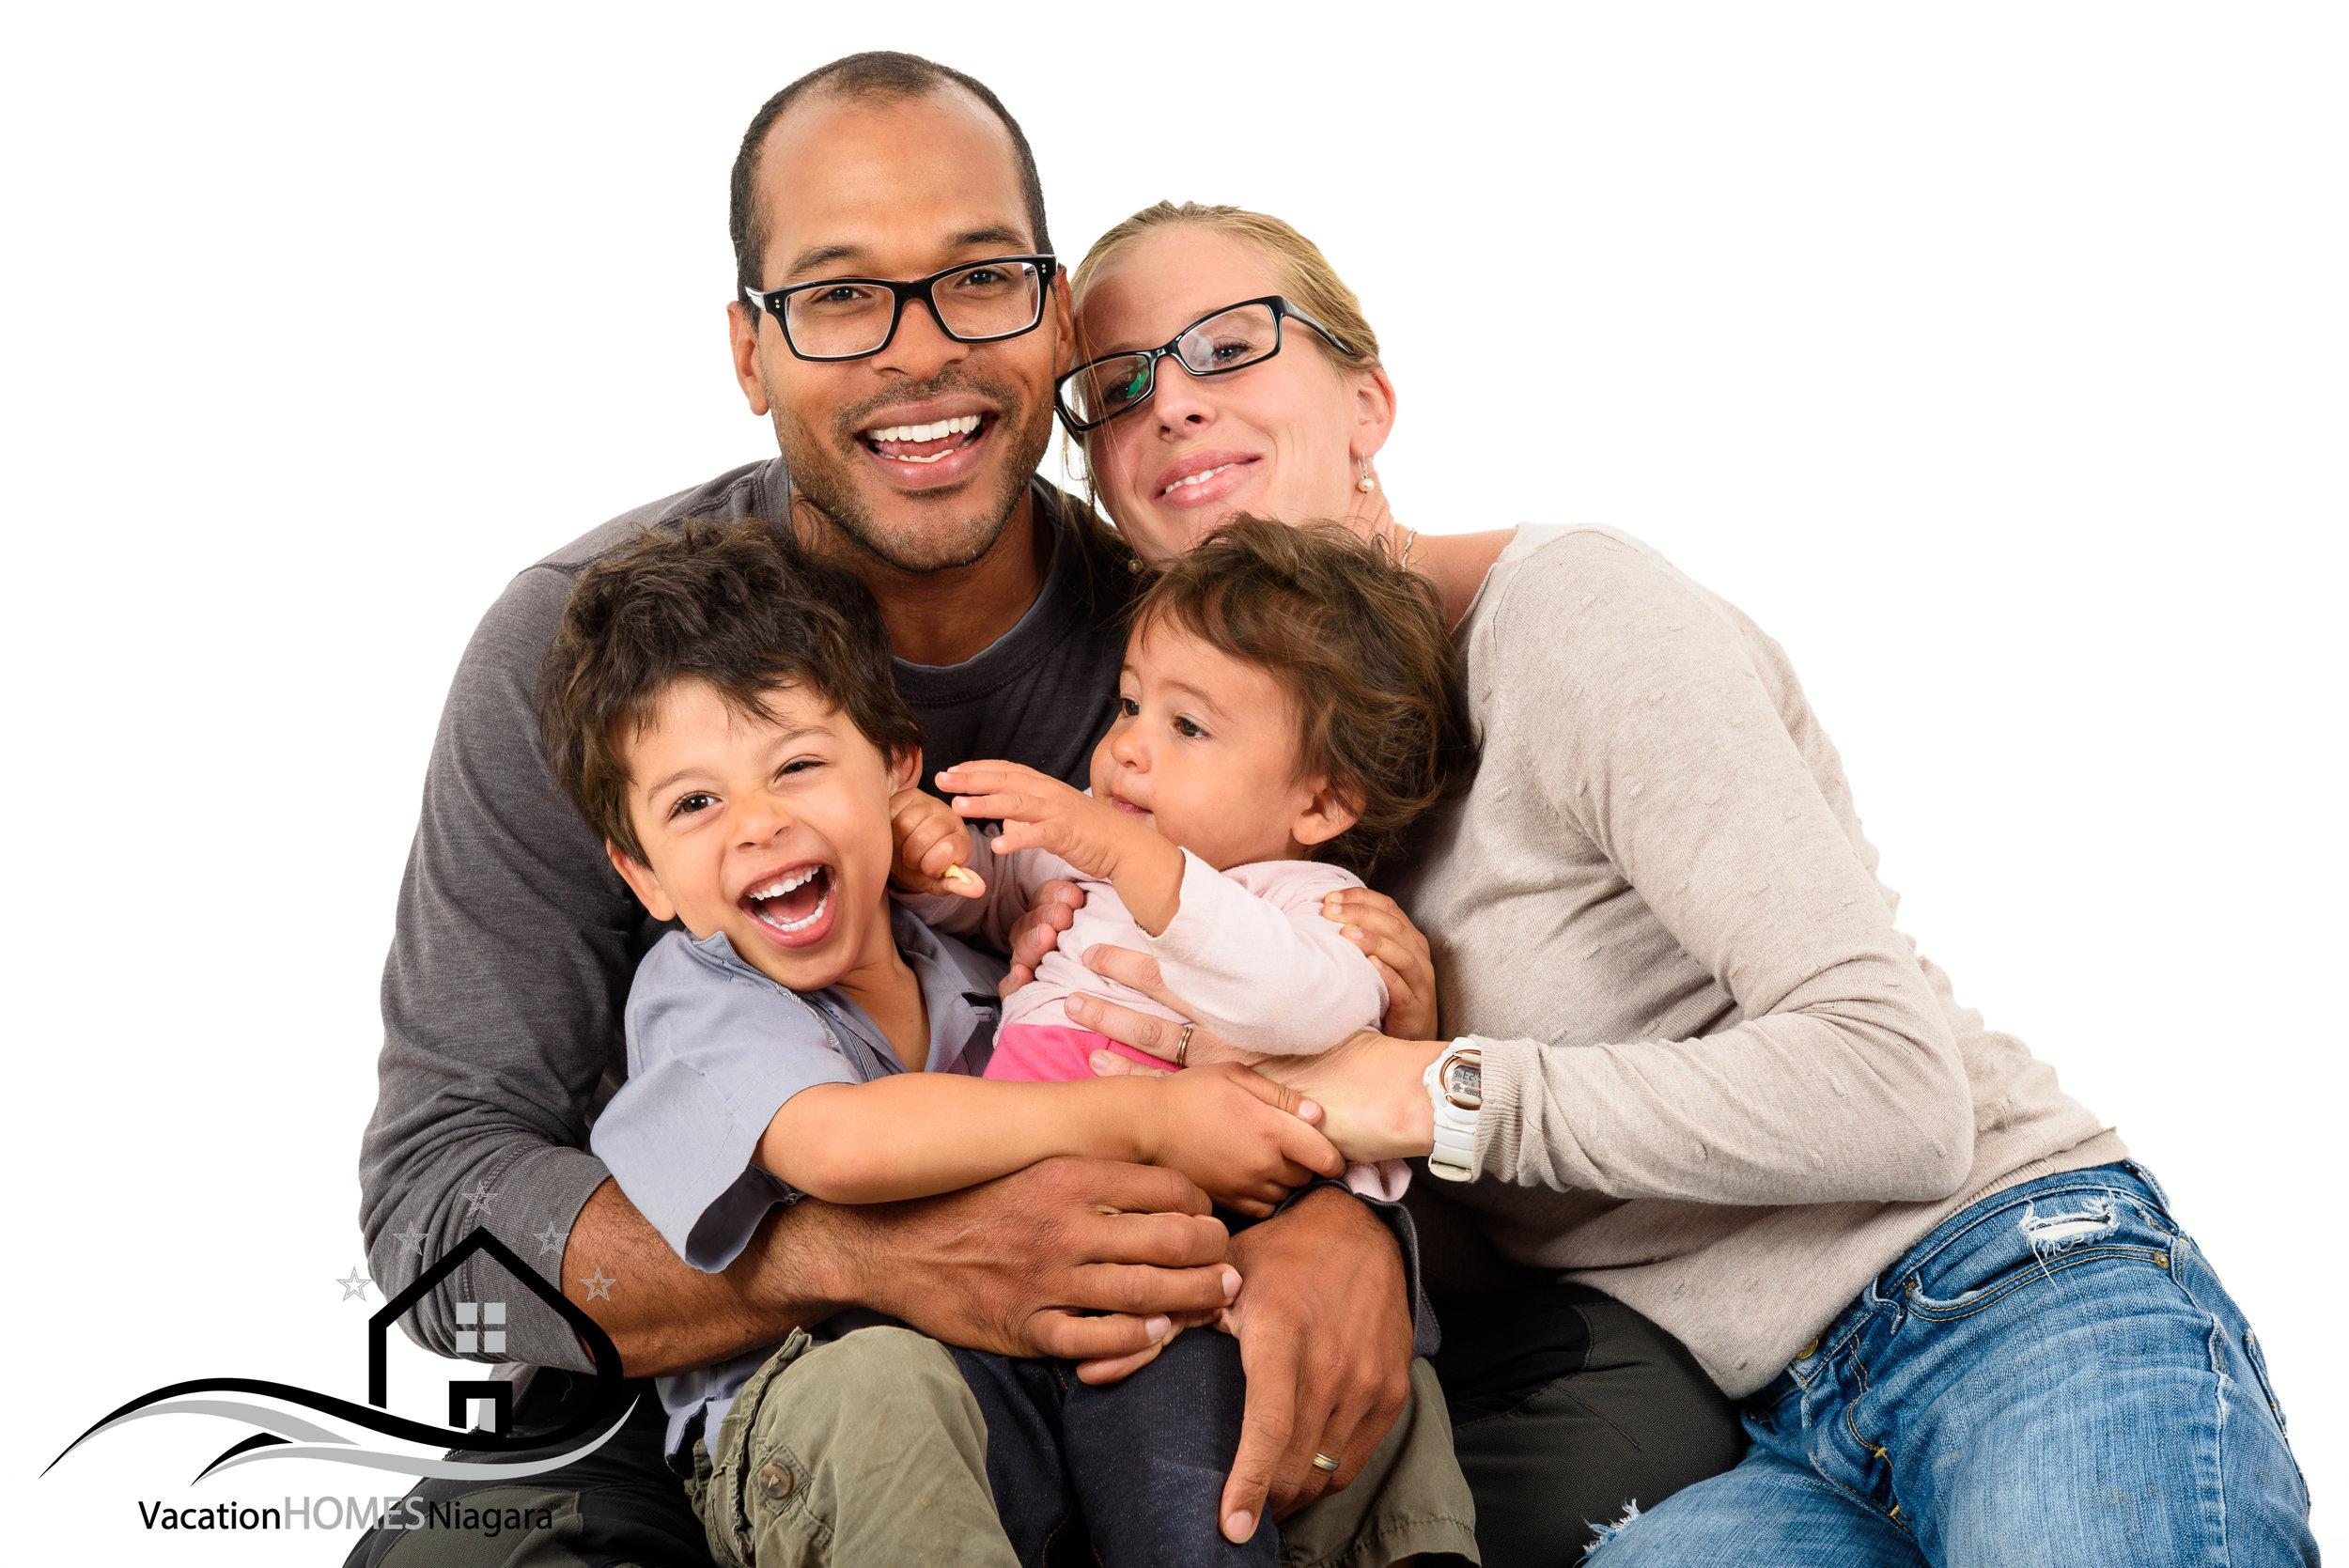 Family_Friendly_Home_Rentals_Niagara_Falls.jpg